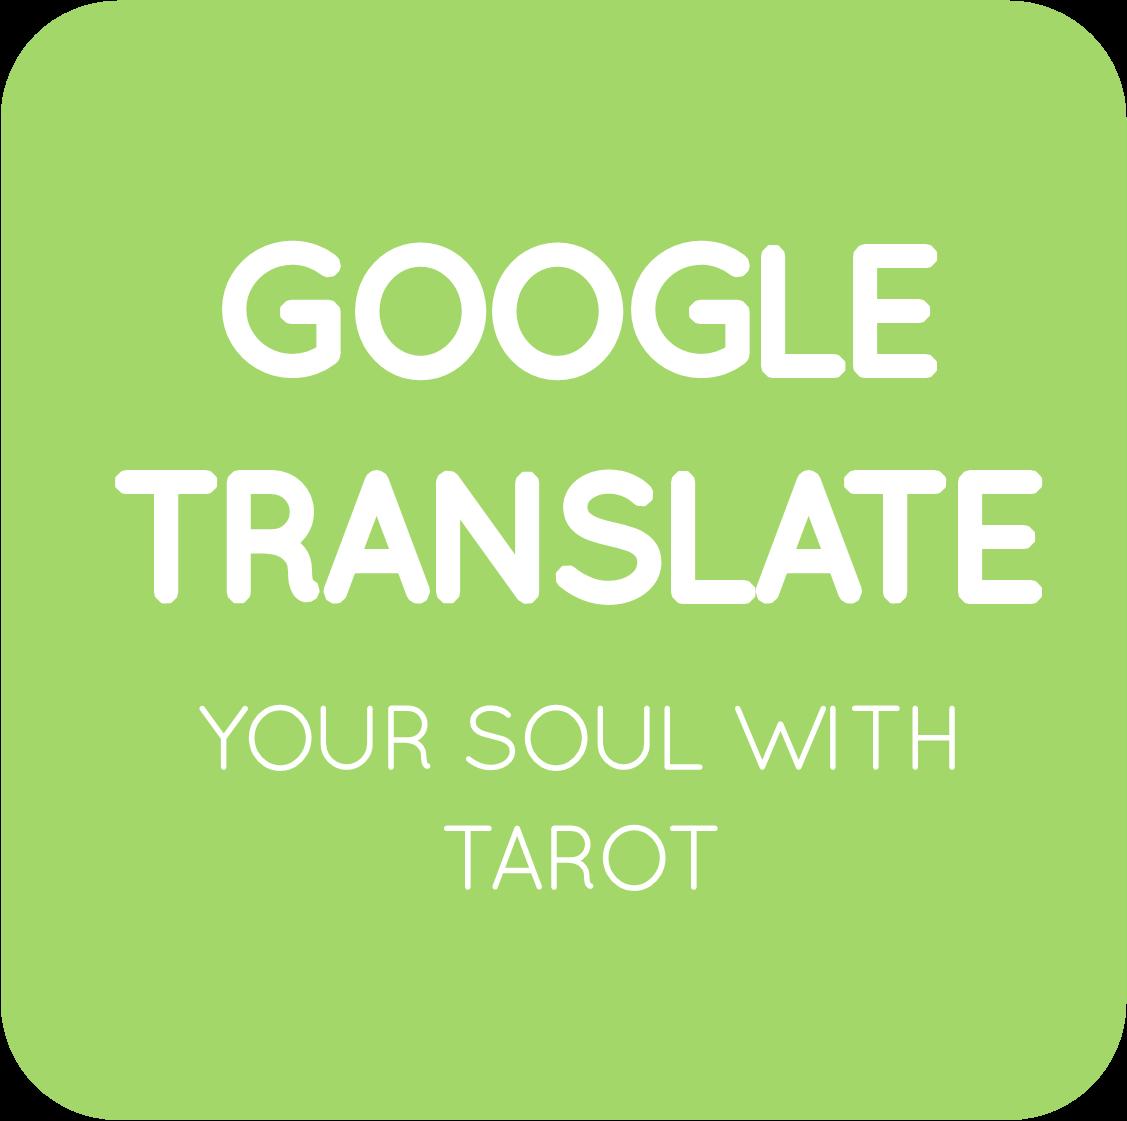 16-google translate your soul.png